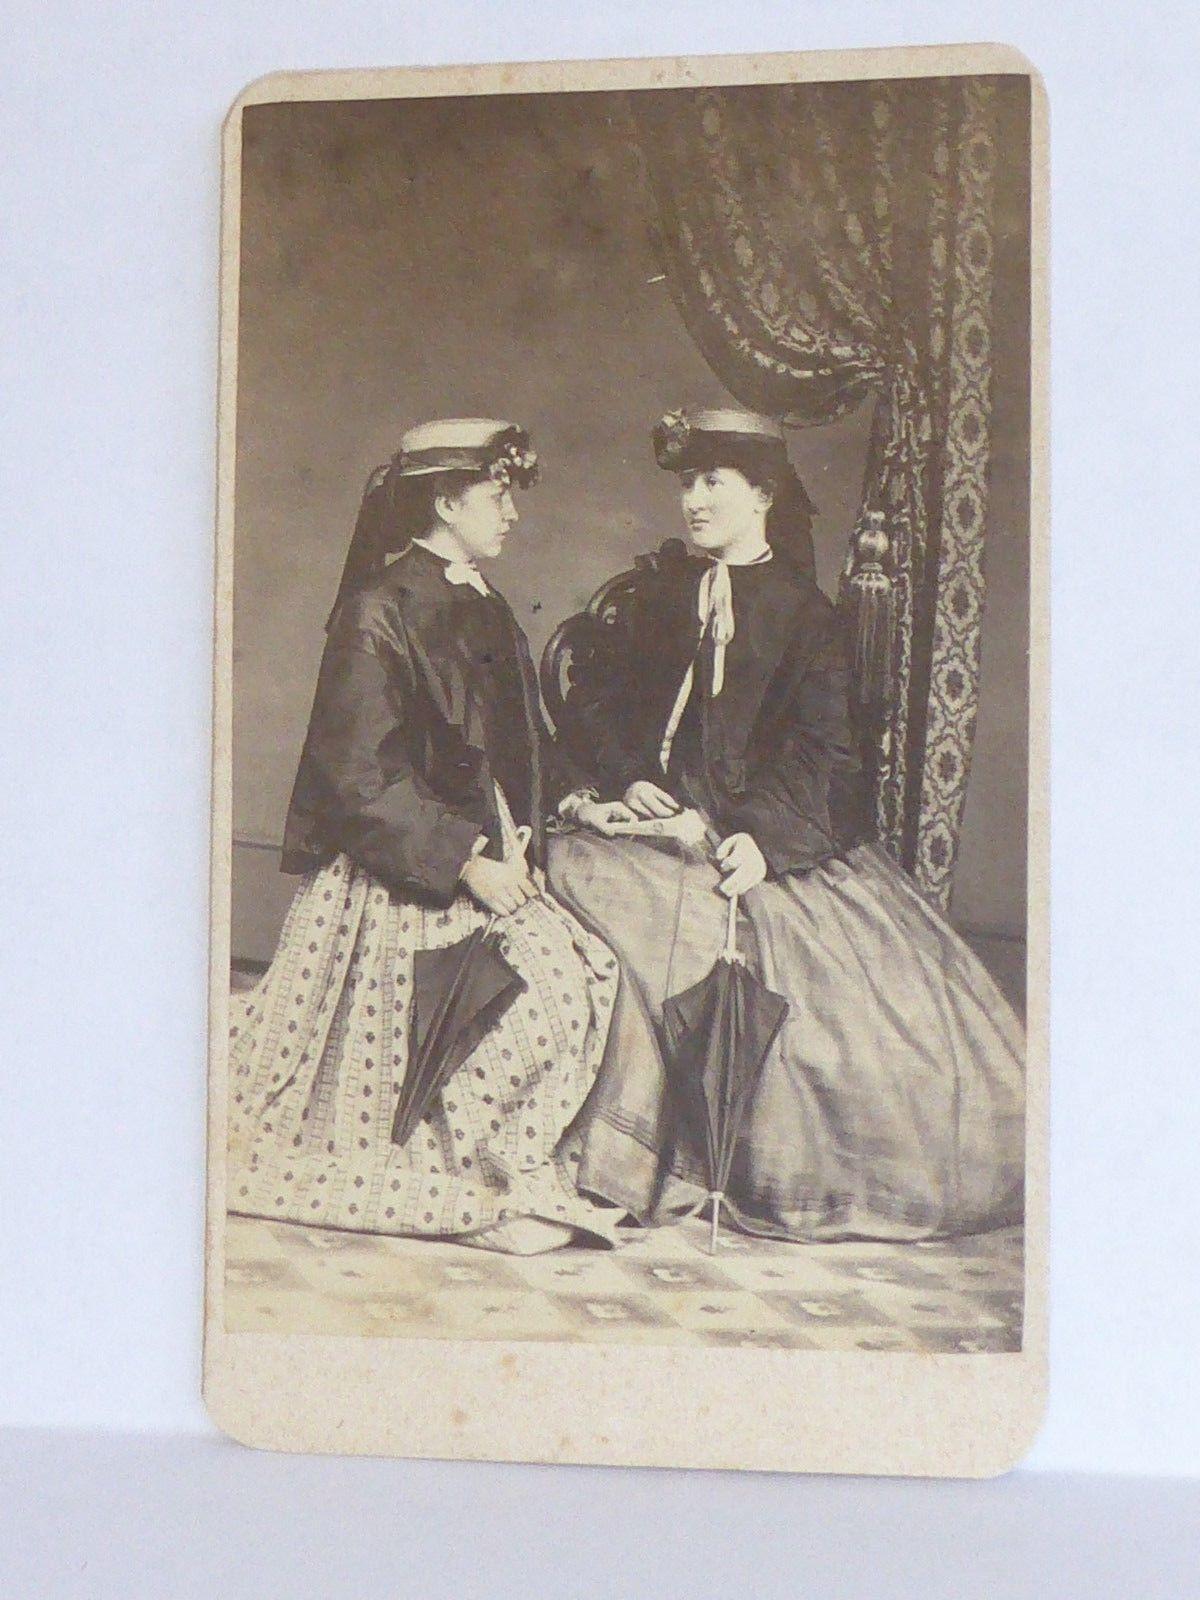 CDV, 1860's, two young woman, jackets, parasols, fan, hats.